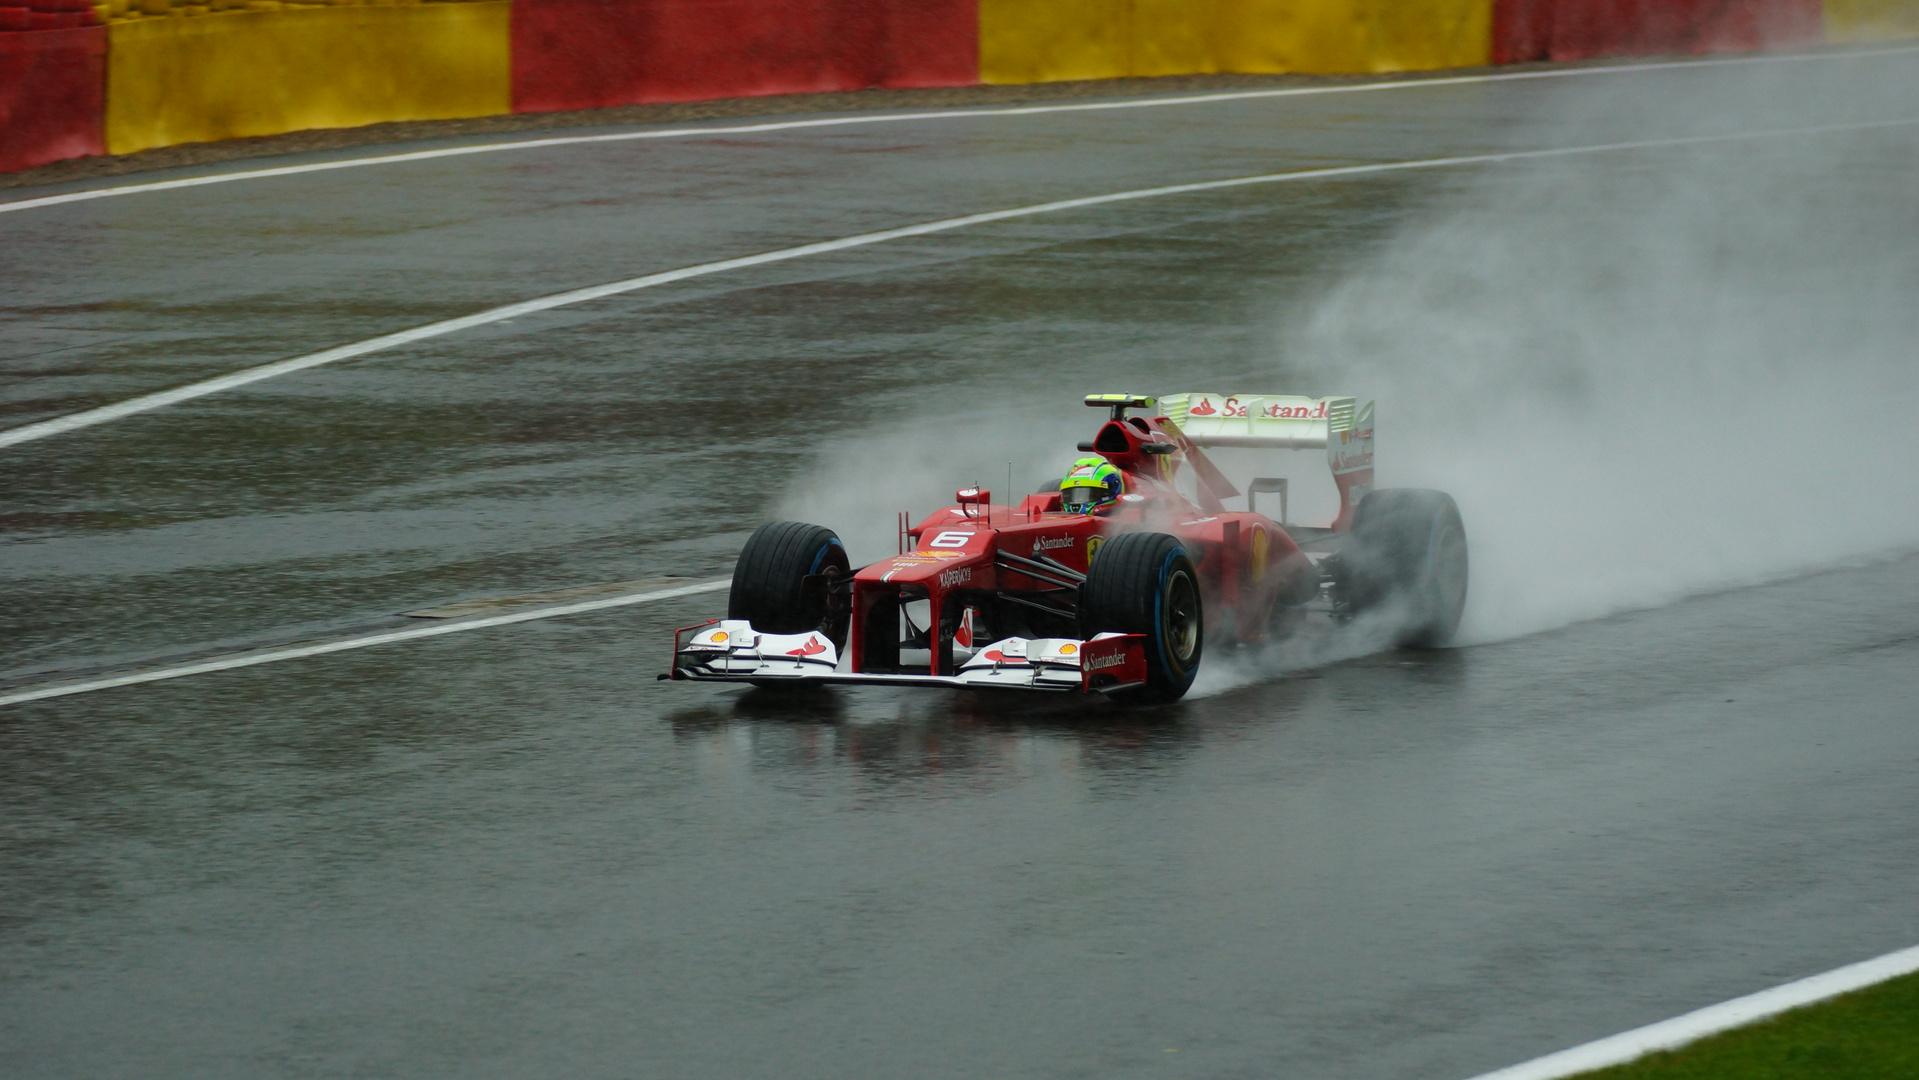 Formel 1 Freitagstraining Spa 2012